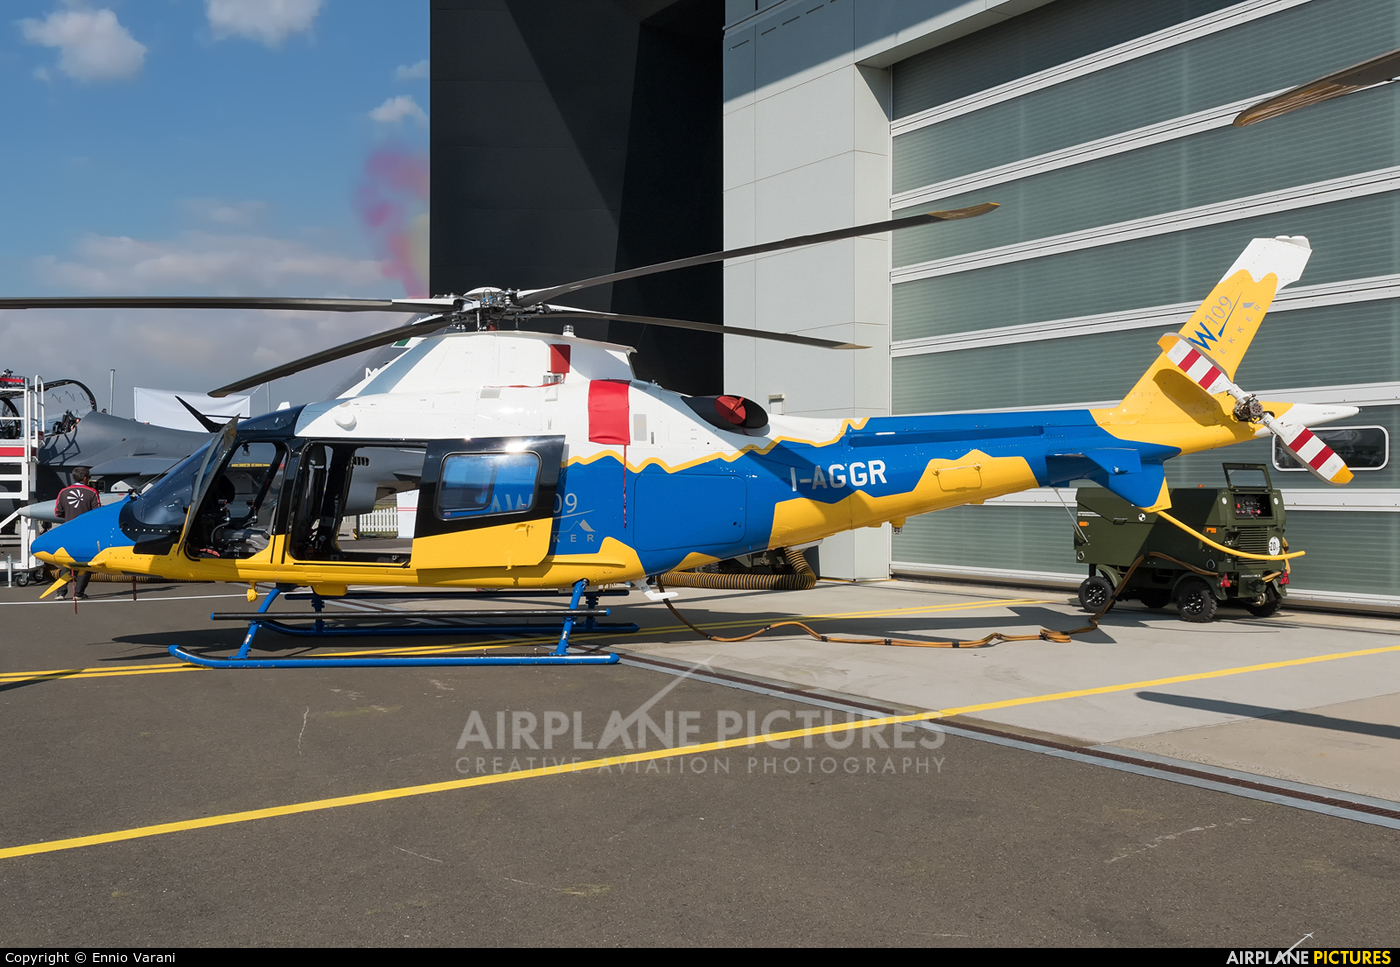 Agusta Westland I-AGGR aircraft at Zeltweg